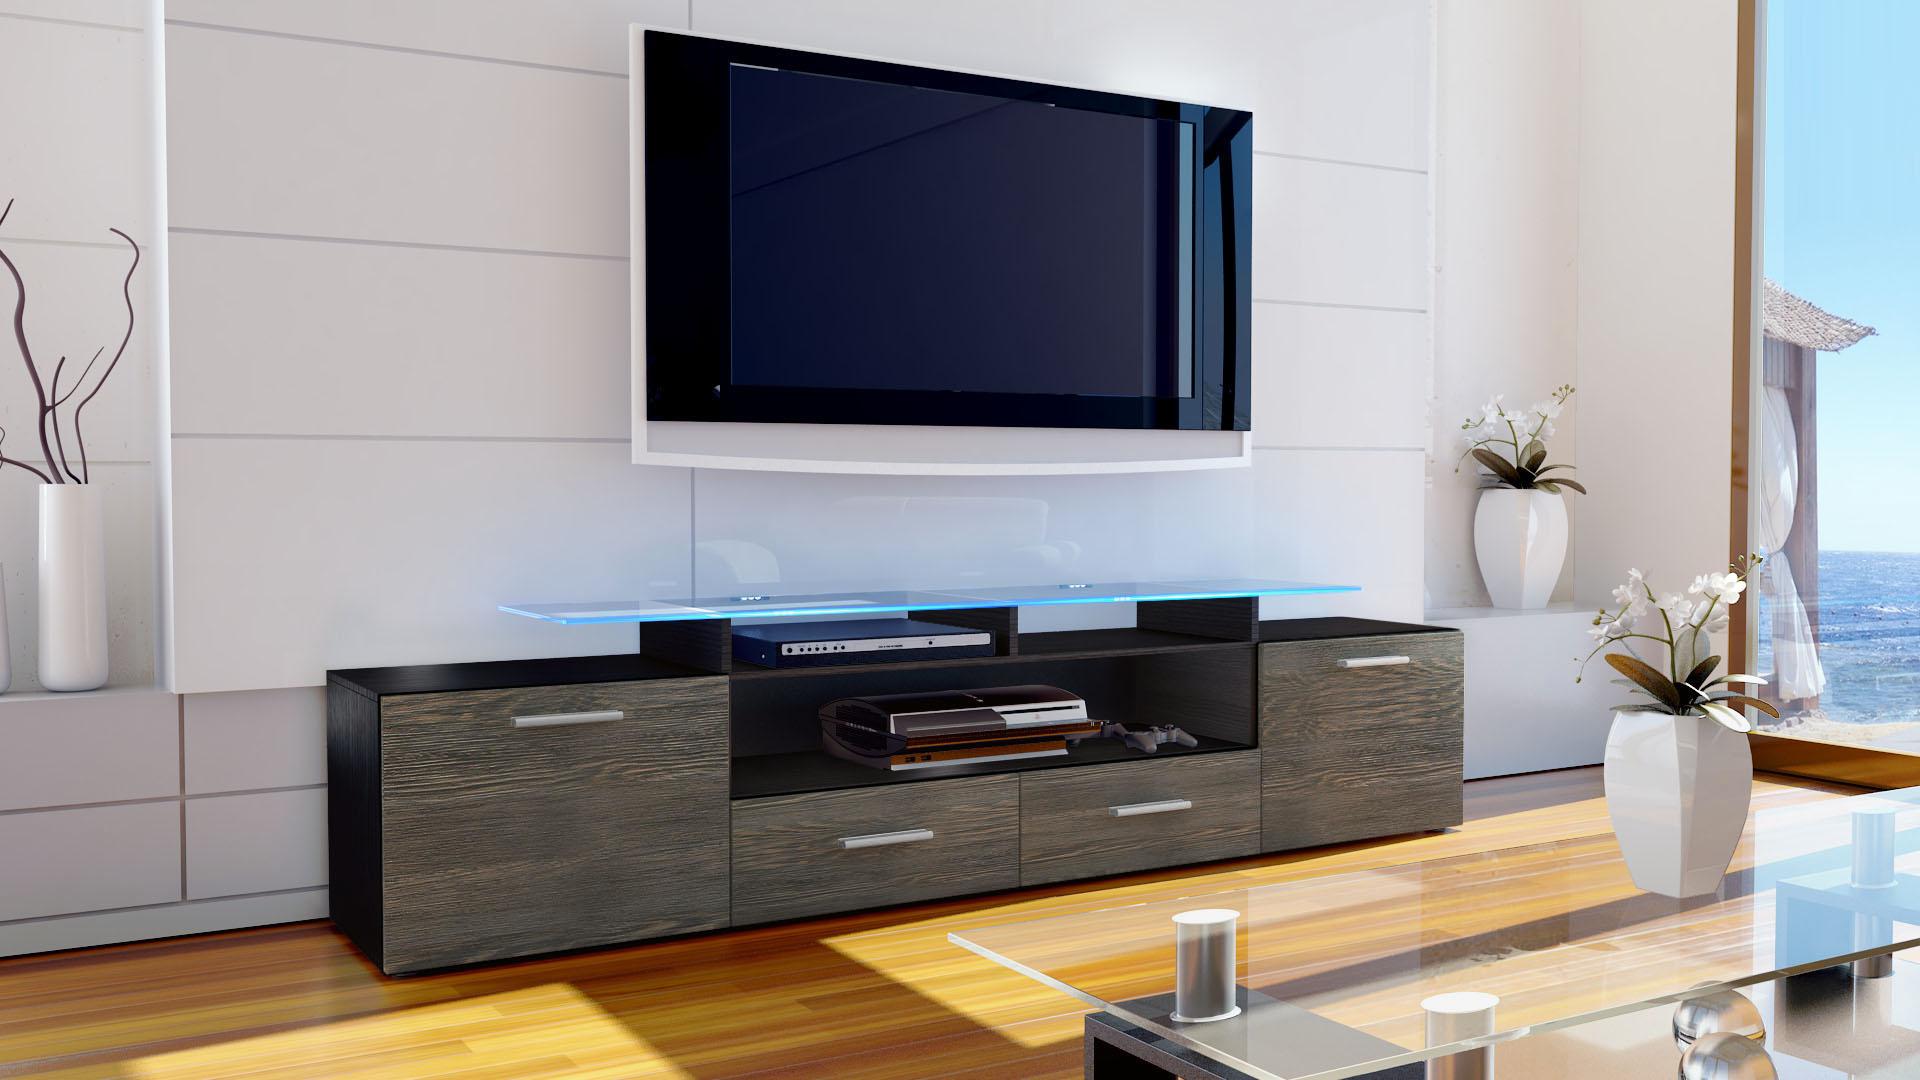 tv lowboard board schrank m bel fernseh regal tisch almada v2 schwarz hochglanz ebay. Black Bedroom Furniture Sets. Home Design Ideas